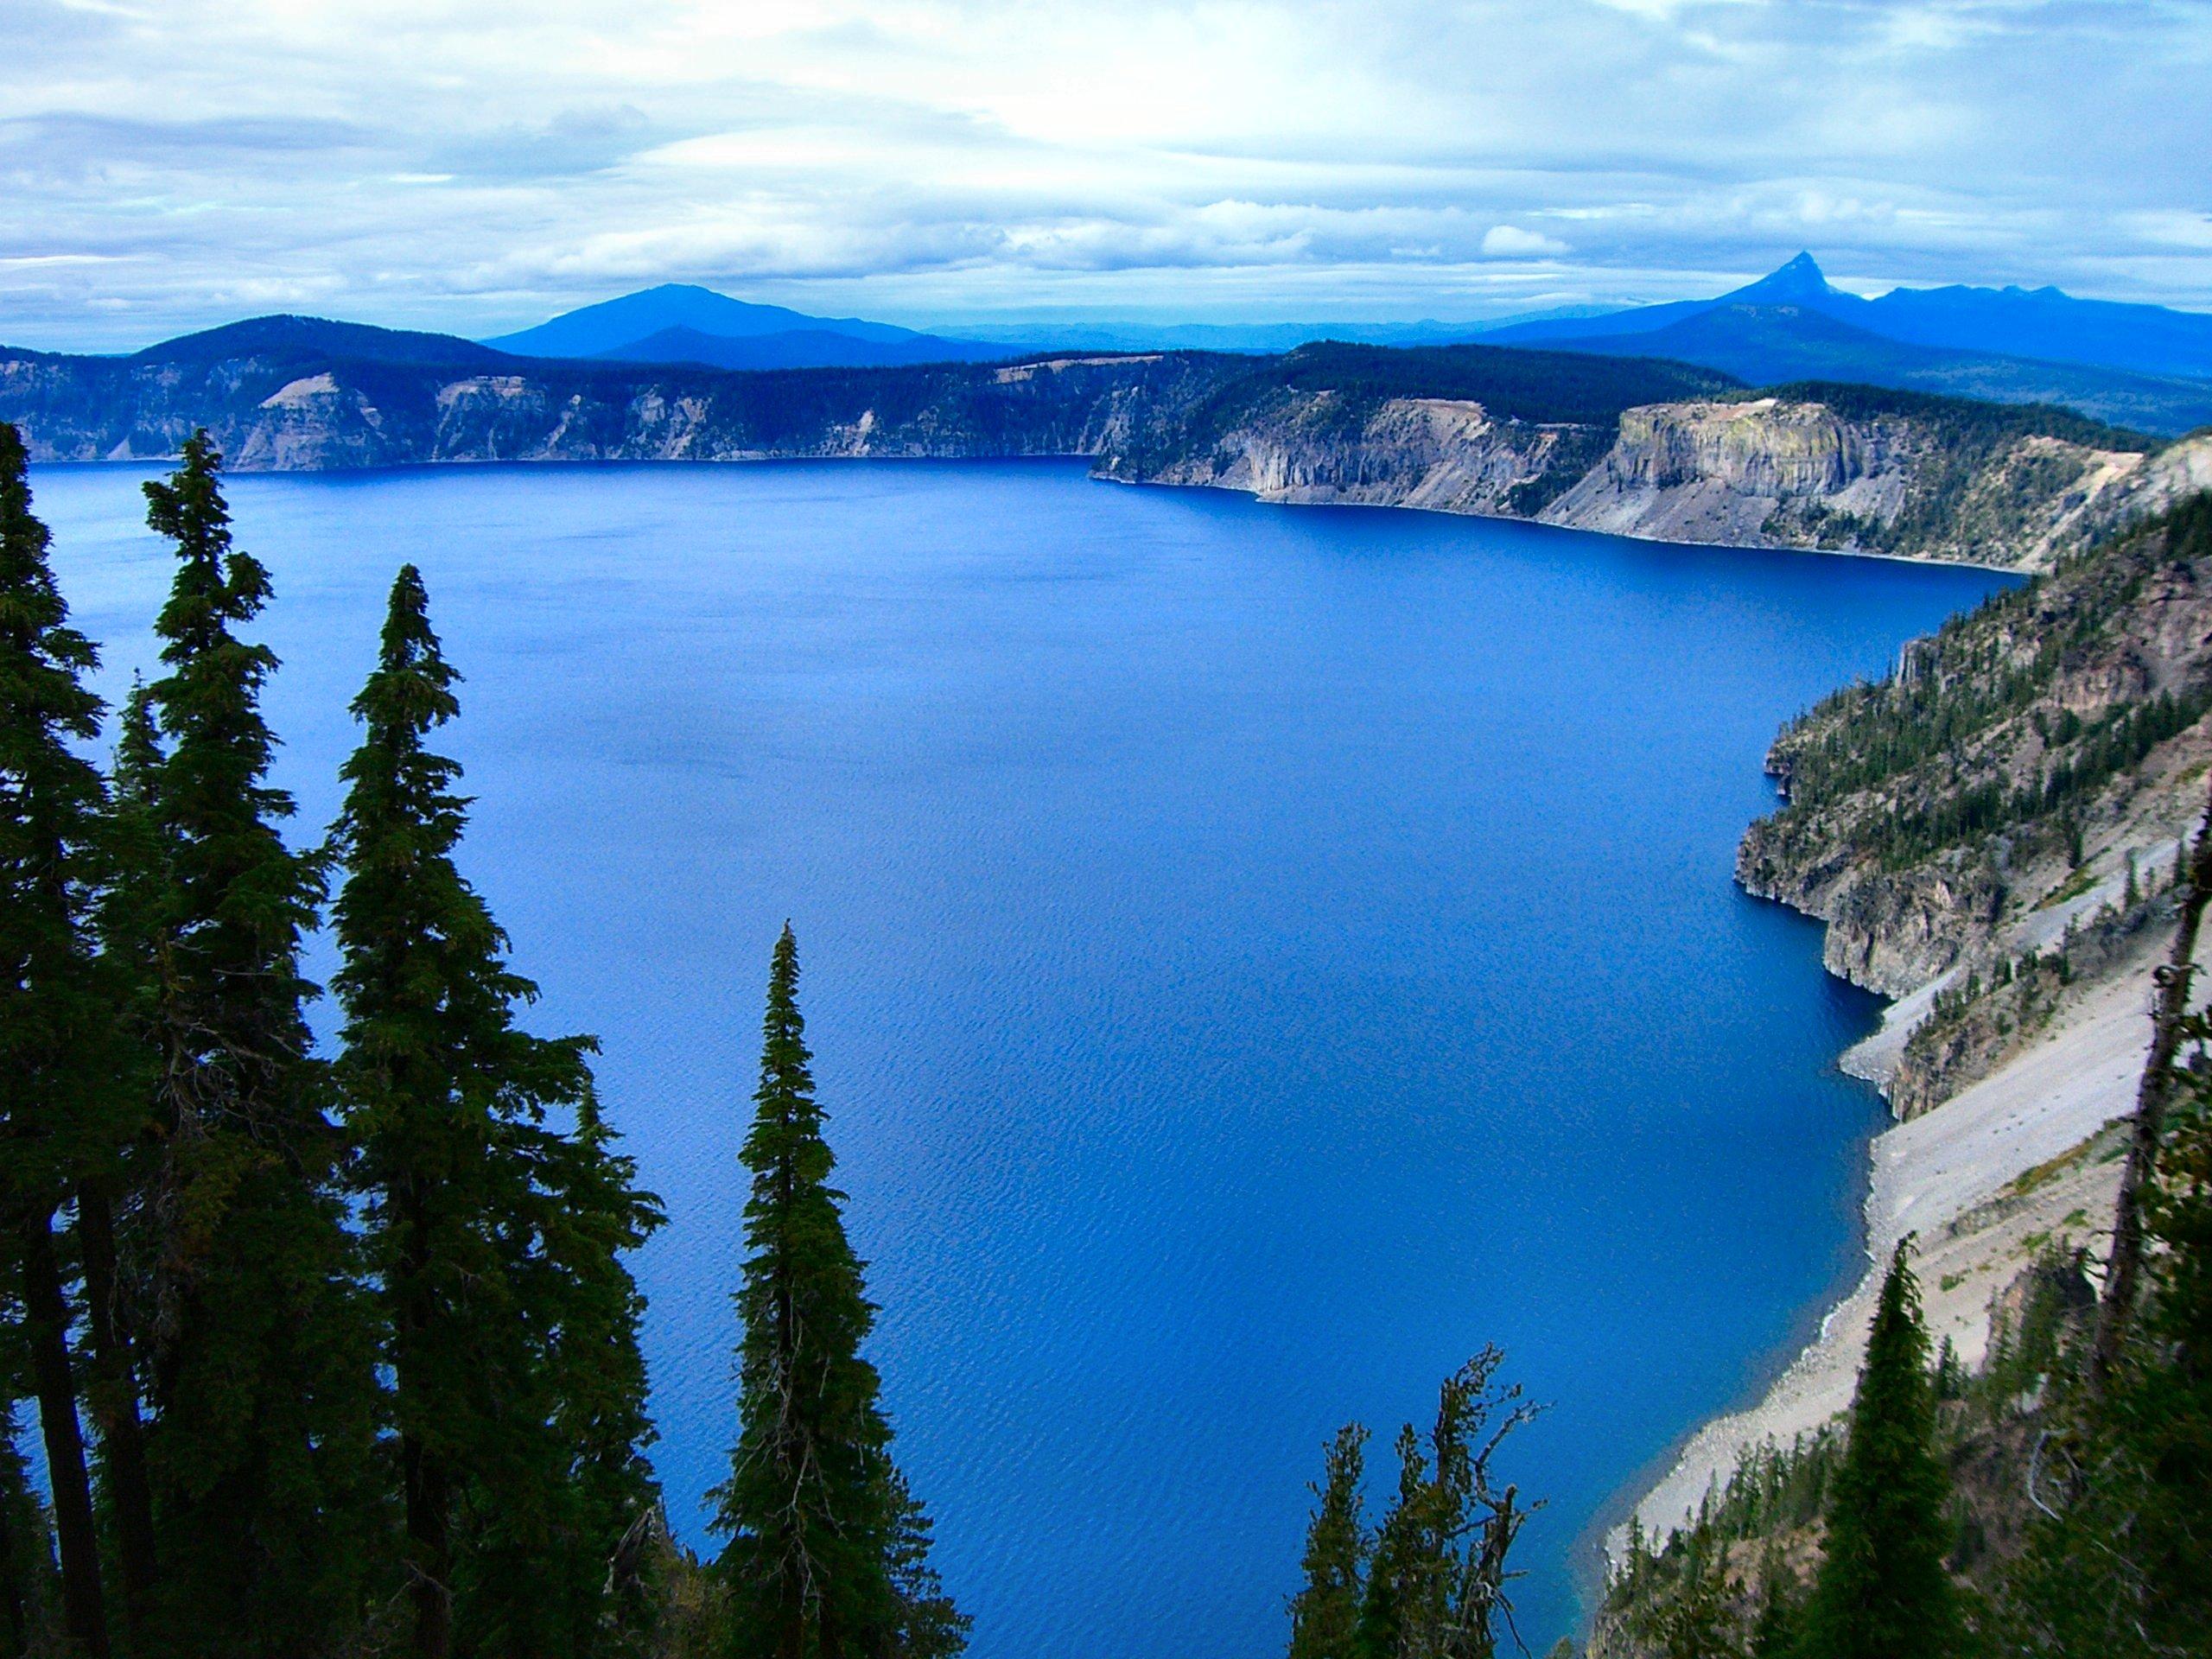 pin crater lake oregon - photo #25